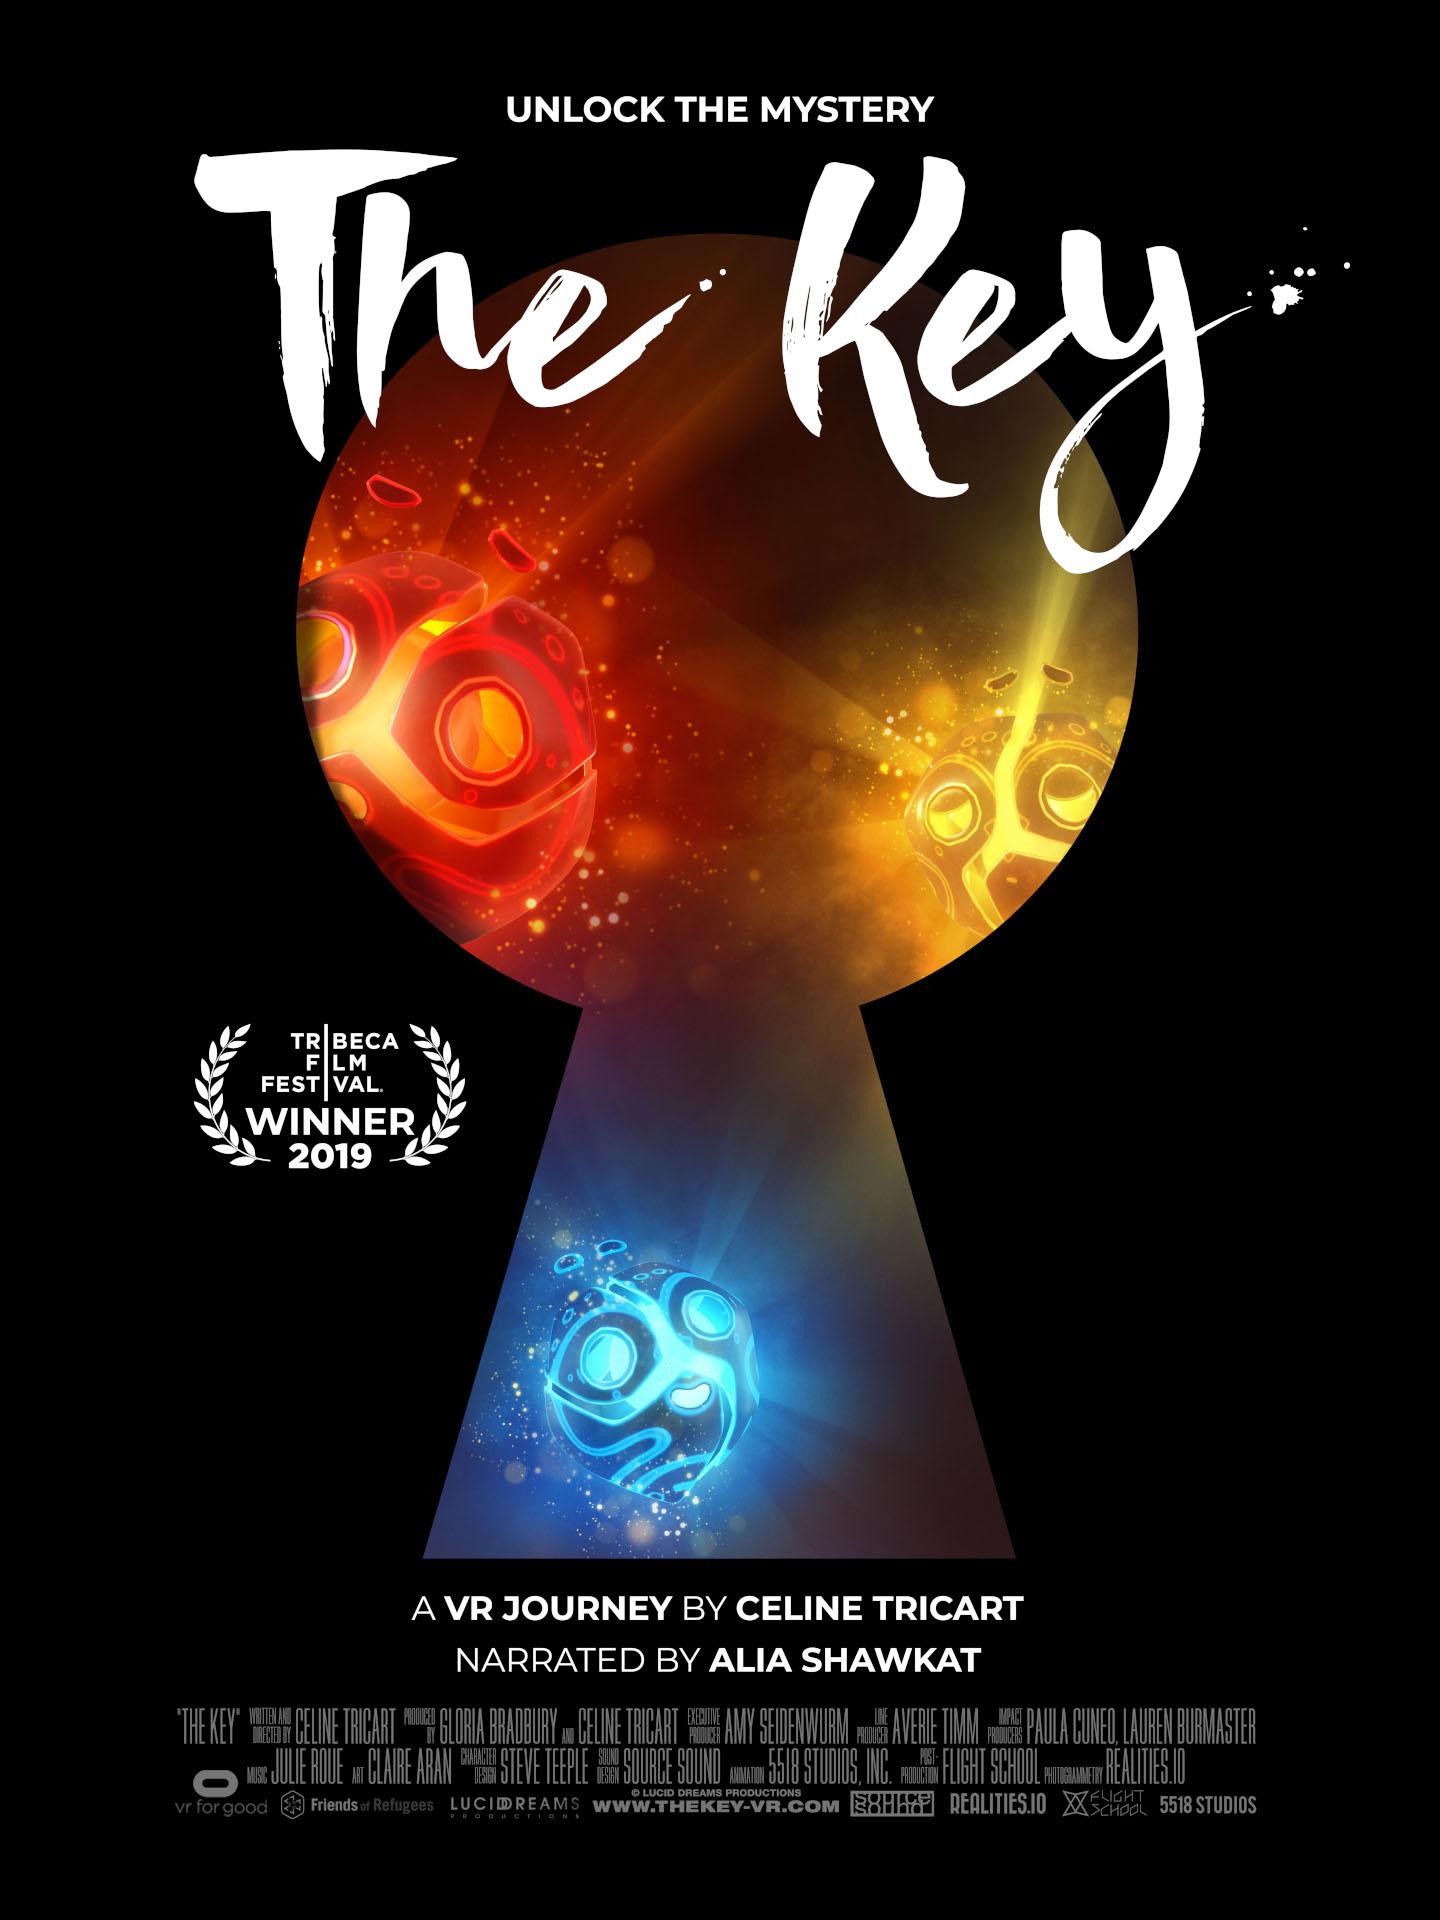 TheKey_poster.jpg